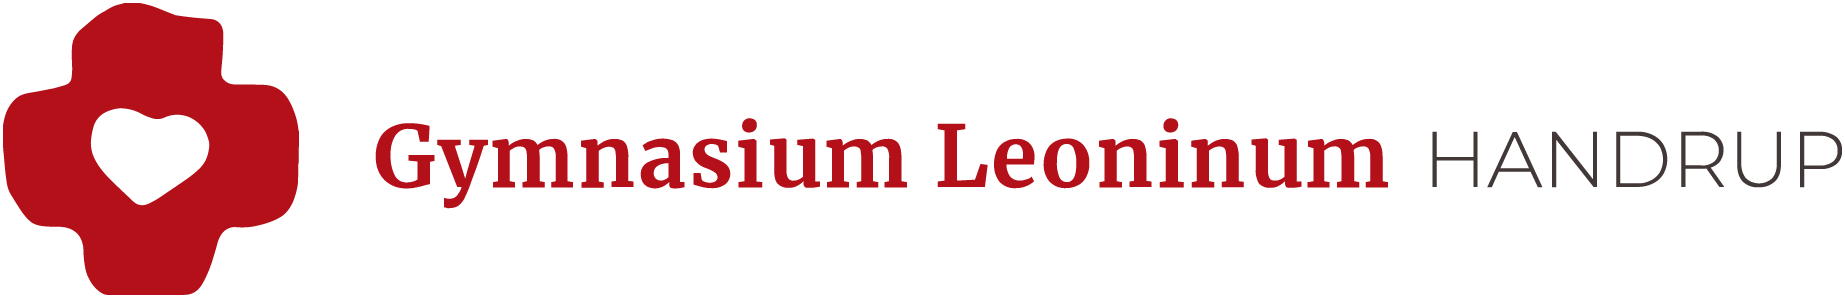 Gymnasium Leoninum Handrup 2021